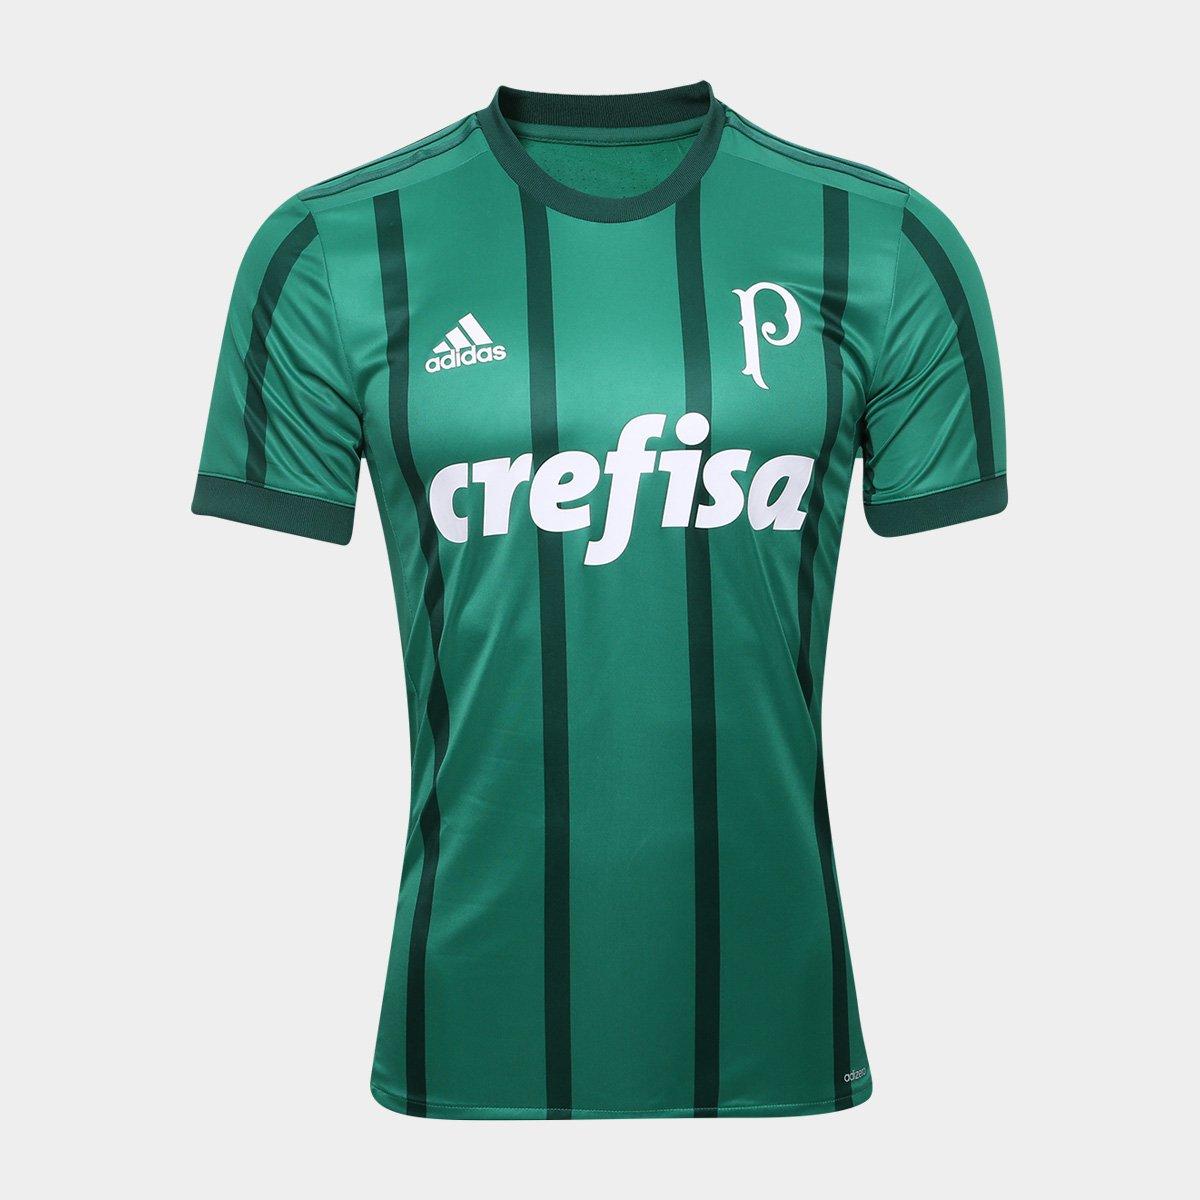 b2285d0a6e Camisa Palmeiras I s/n° 17/18 - Jogador Adidas Masculina | Allianz Parque  Shop